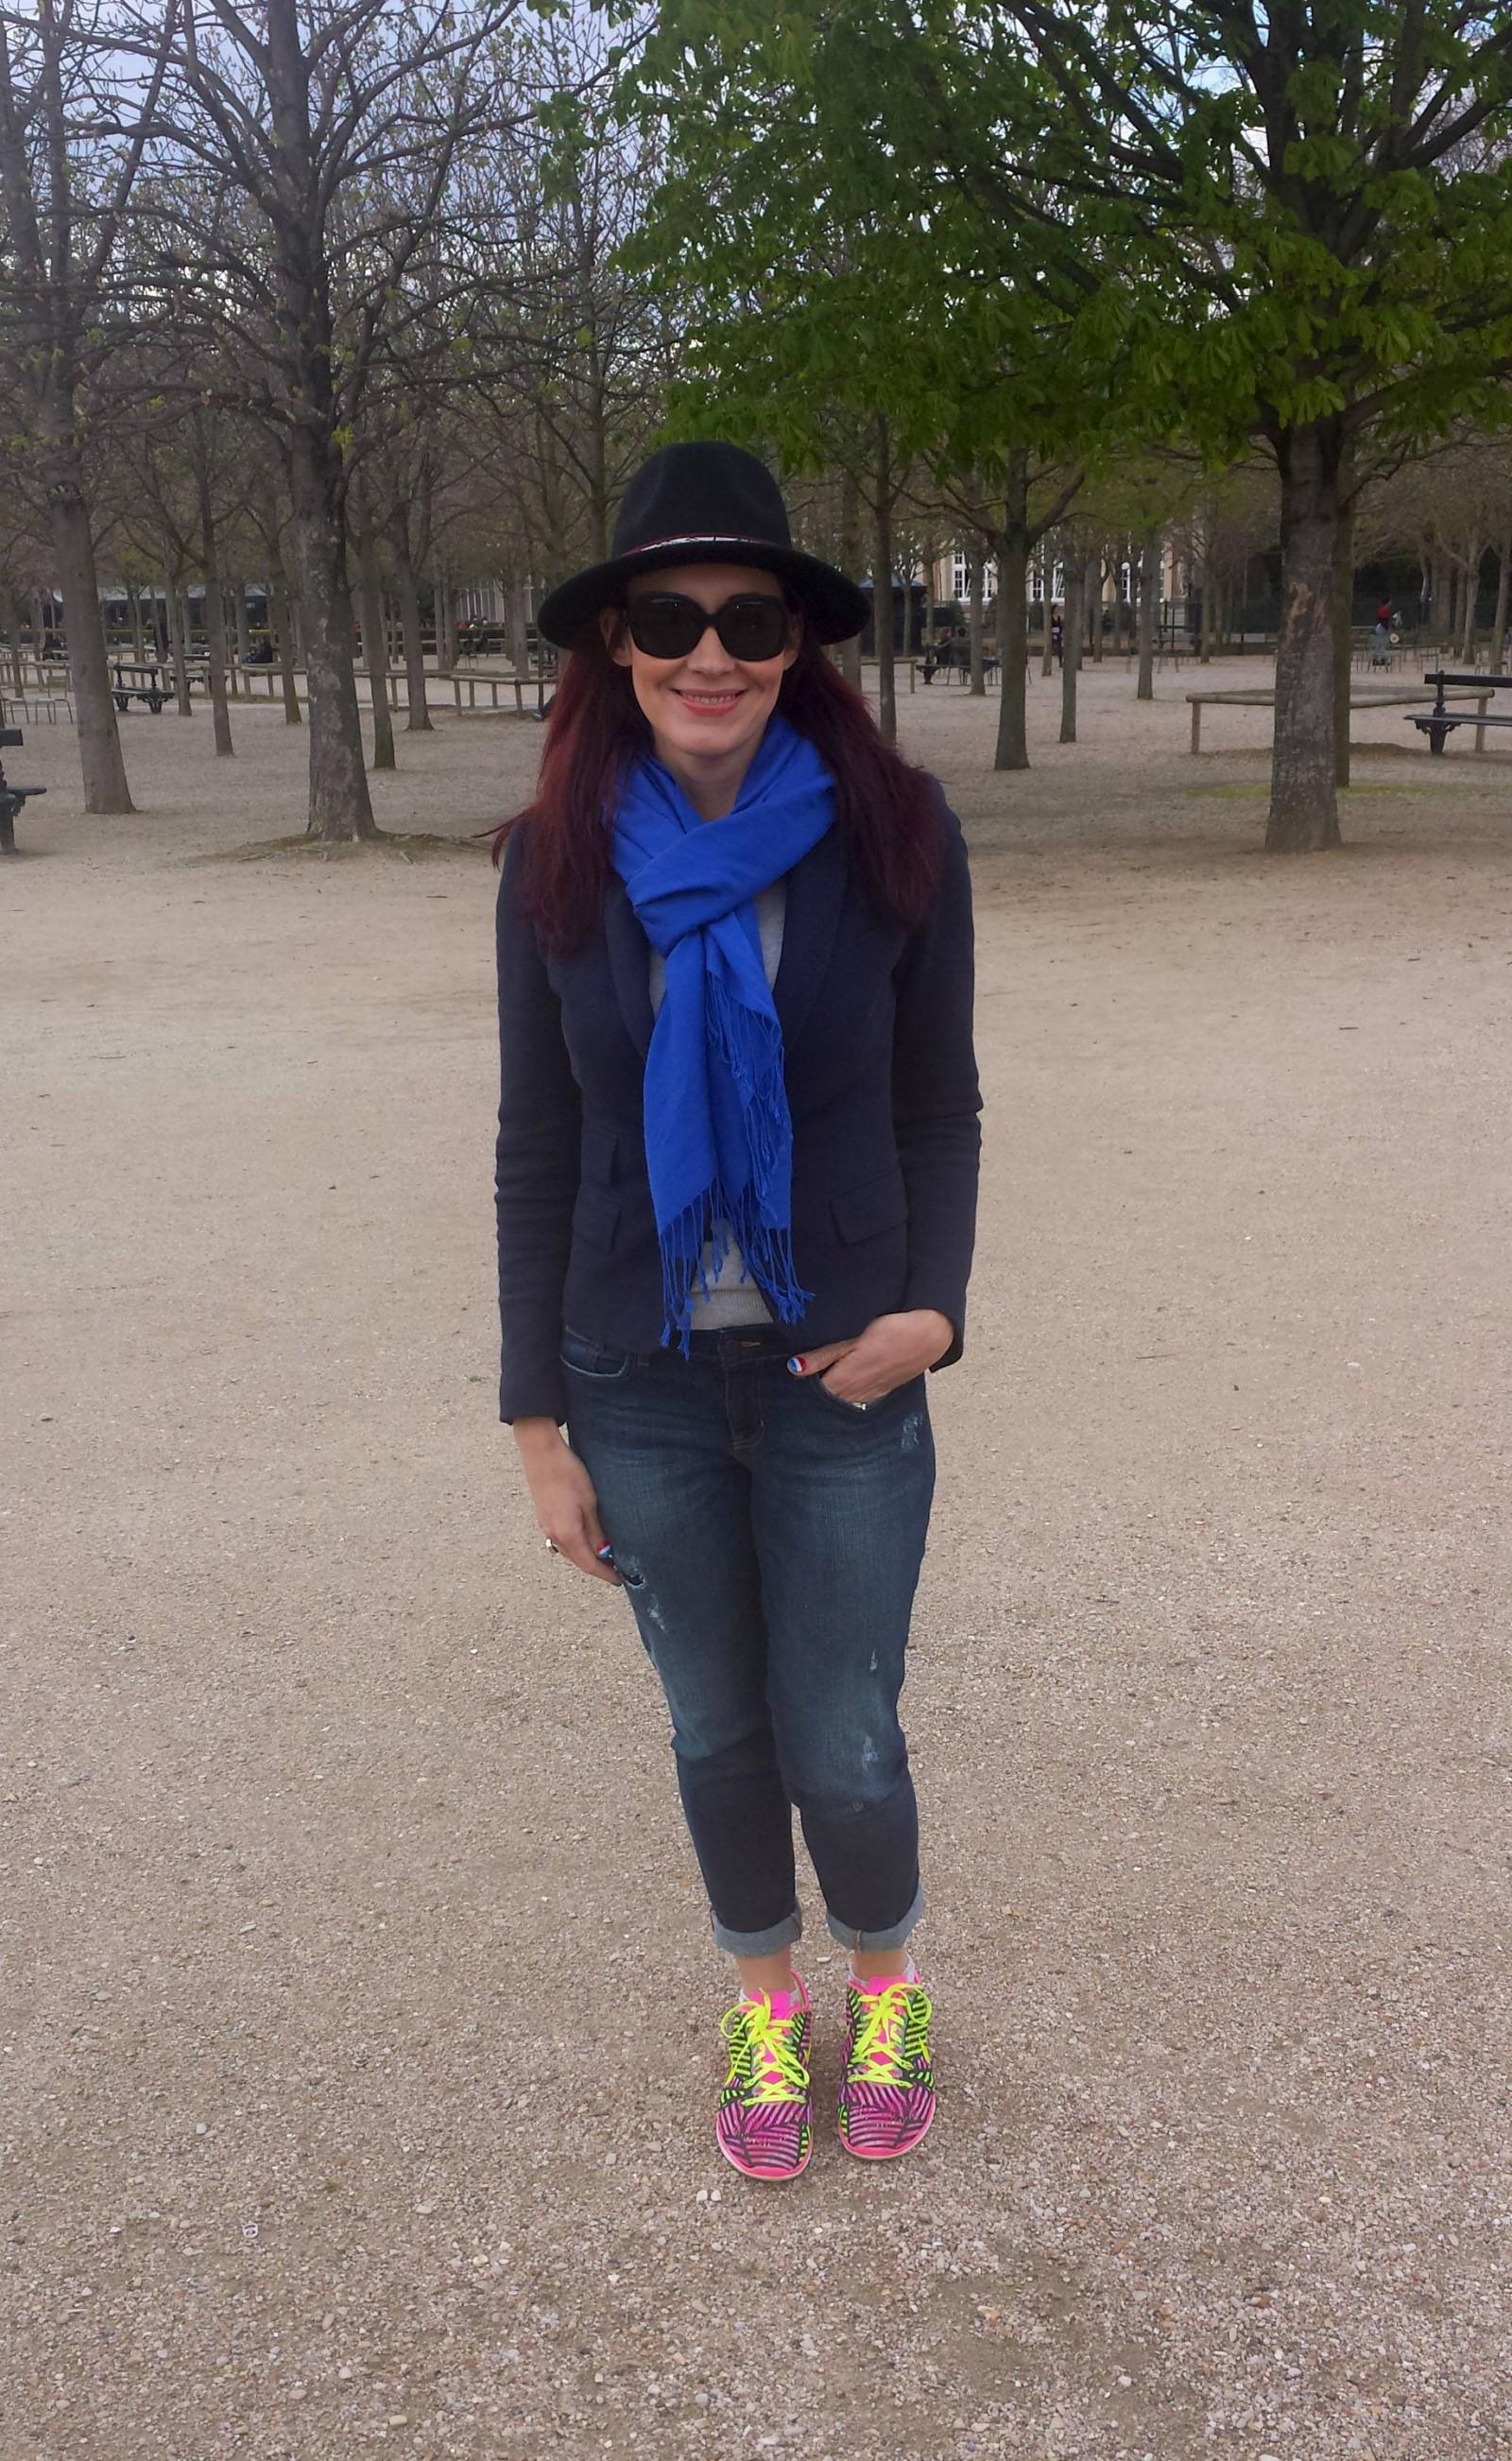 Zara hat and navy jacket Jardin du Luxembourg Paris